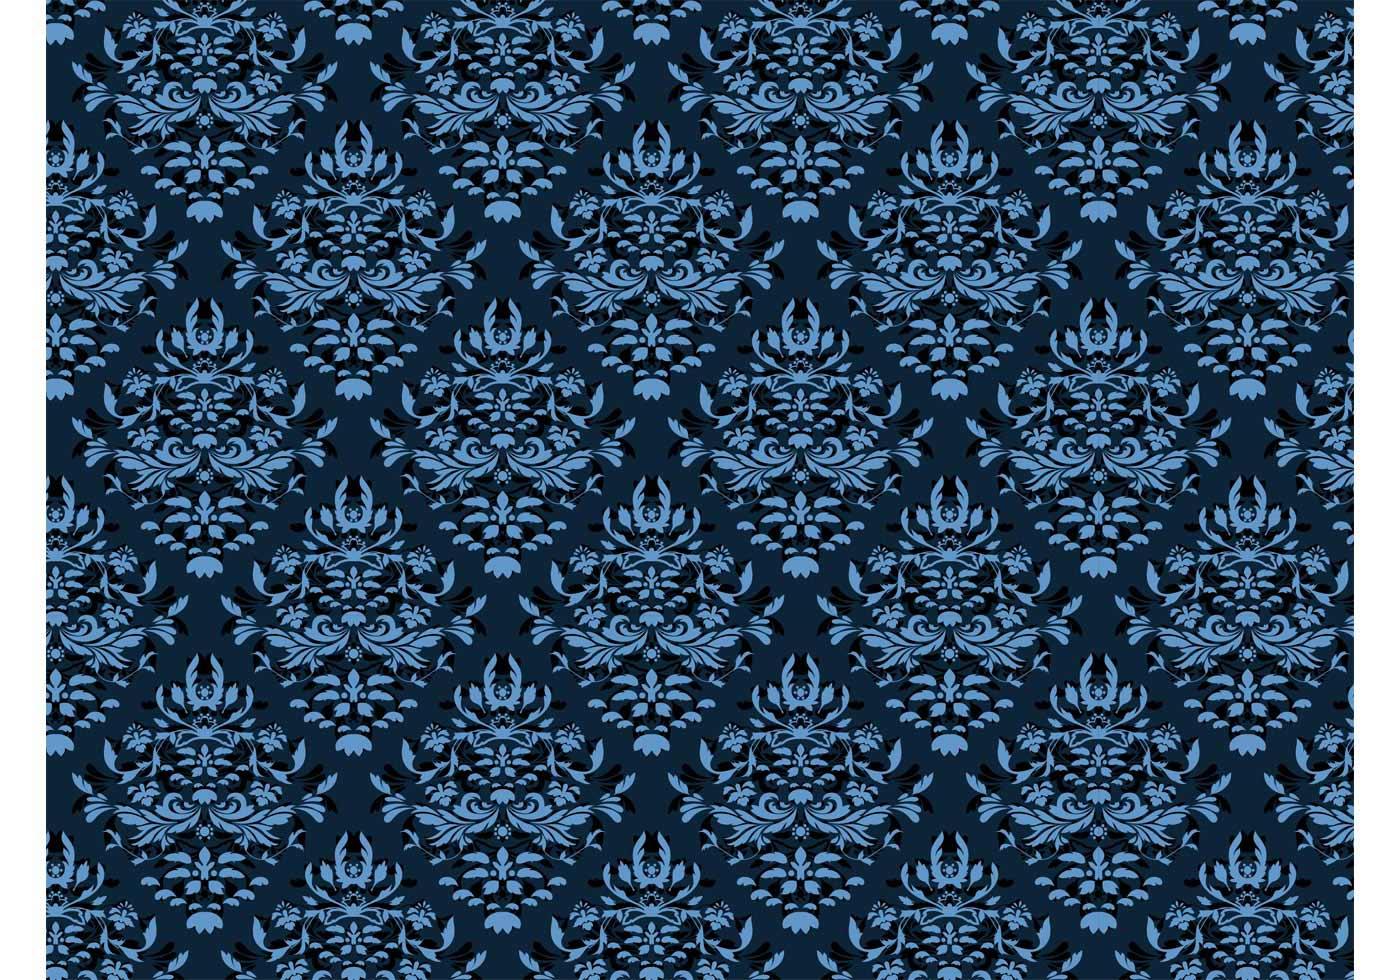 Vintage Interior Pattern Download Free Vector Art Stock